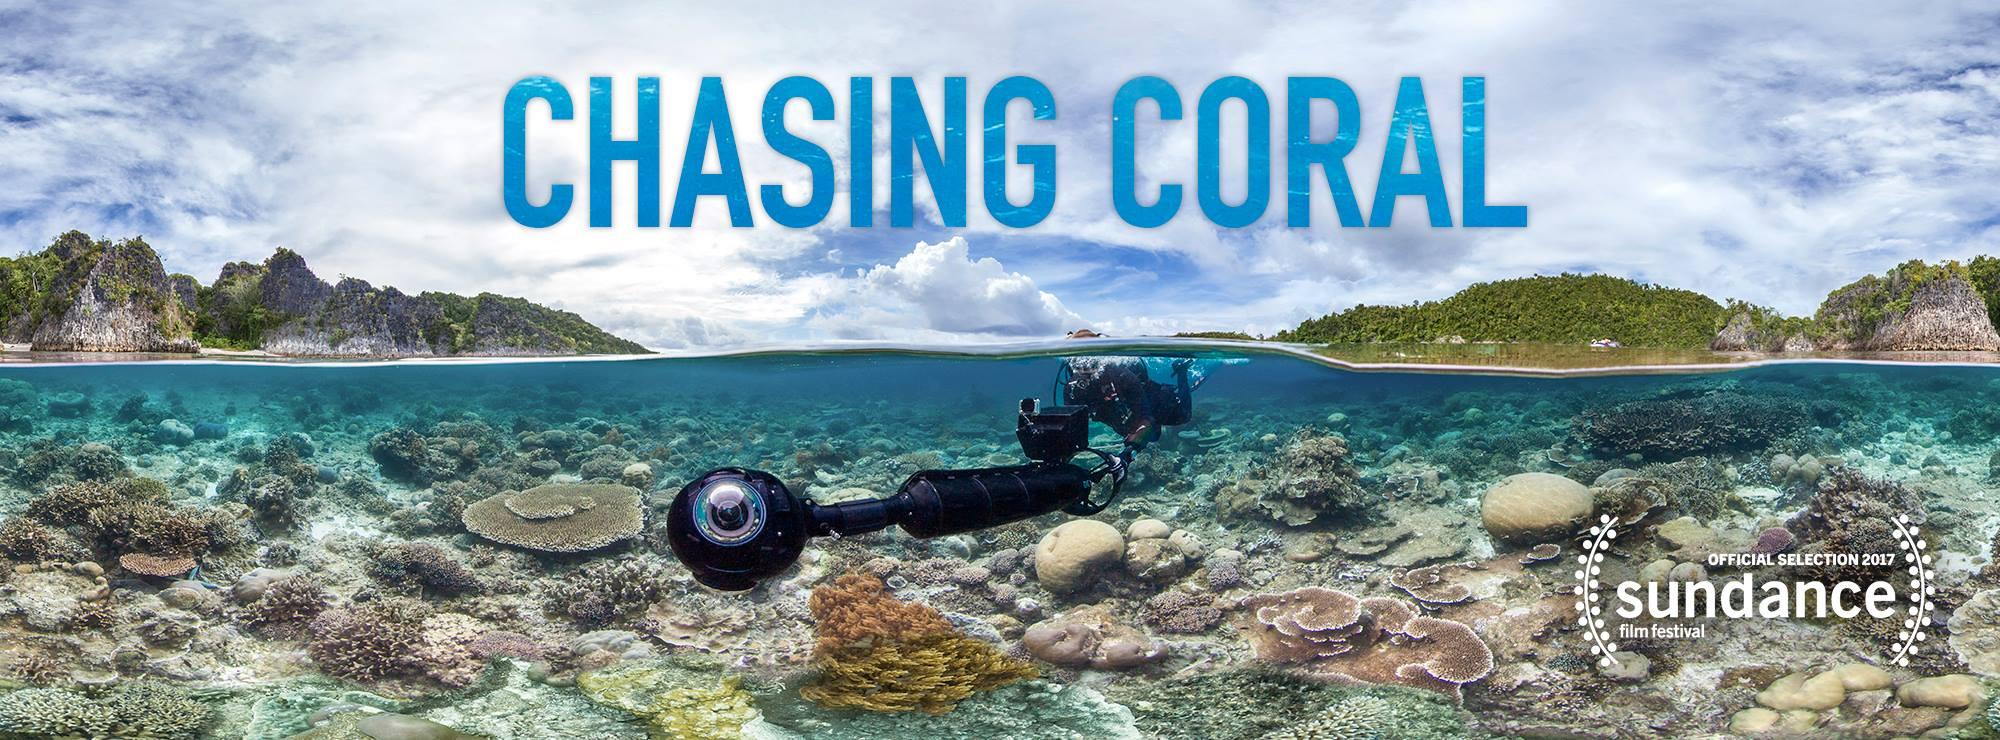 chasing_coral_wide.jpg